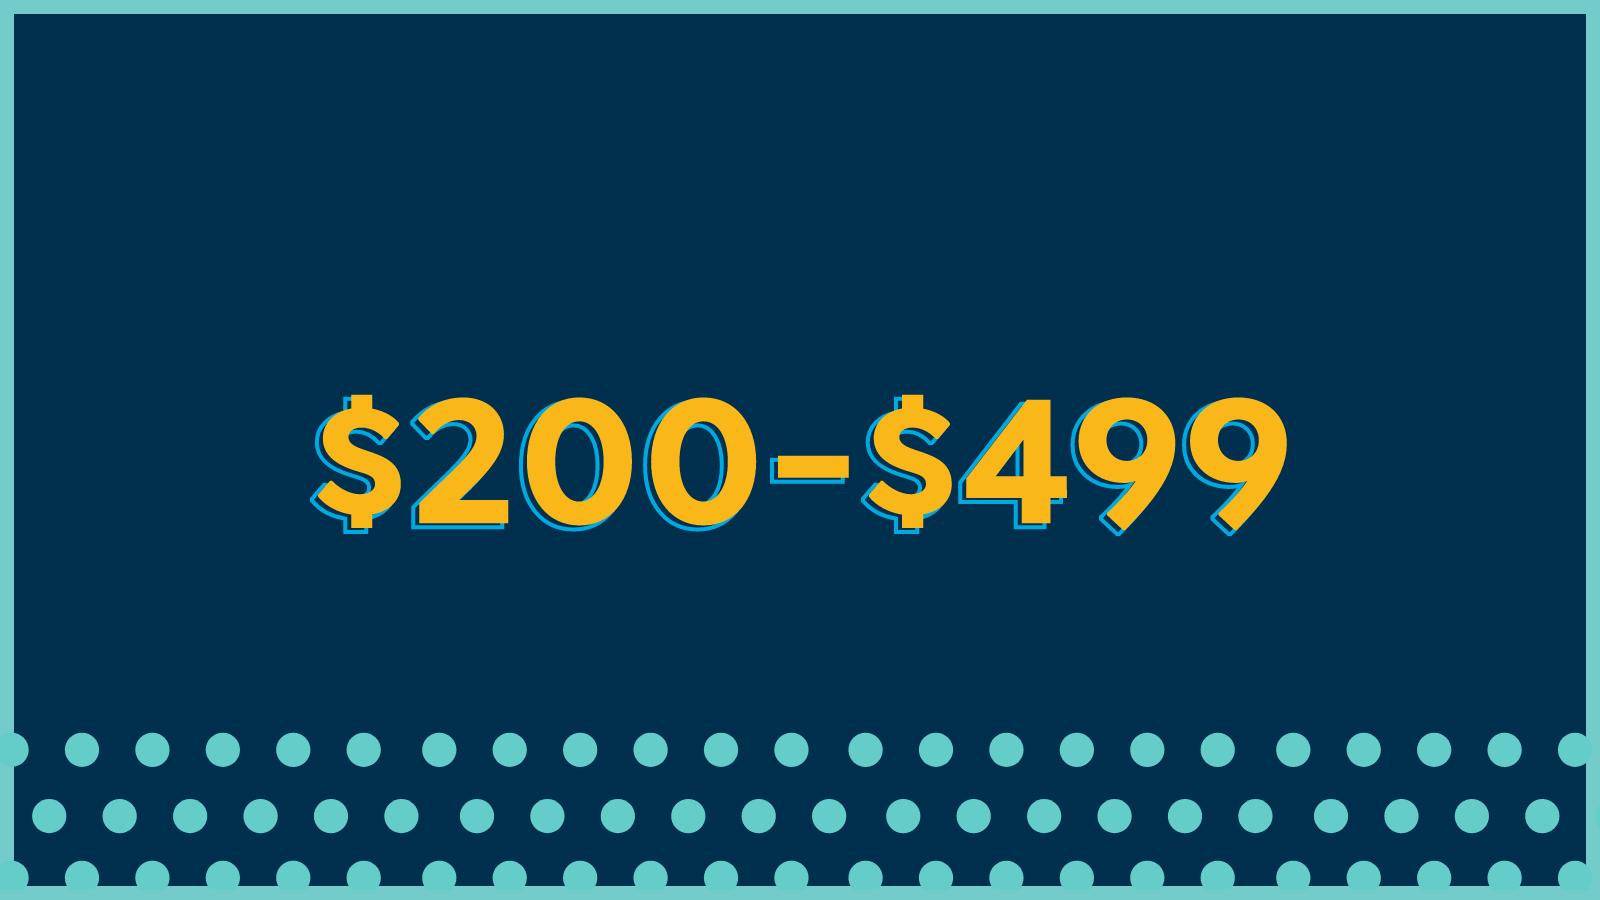 200-499 dollars